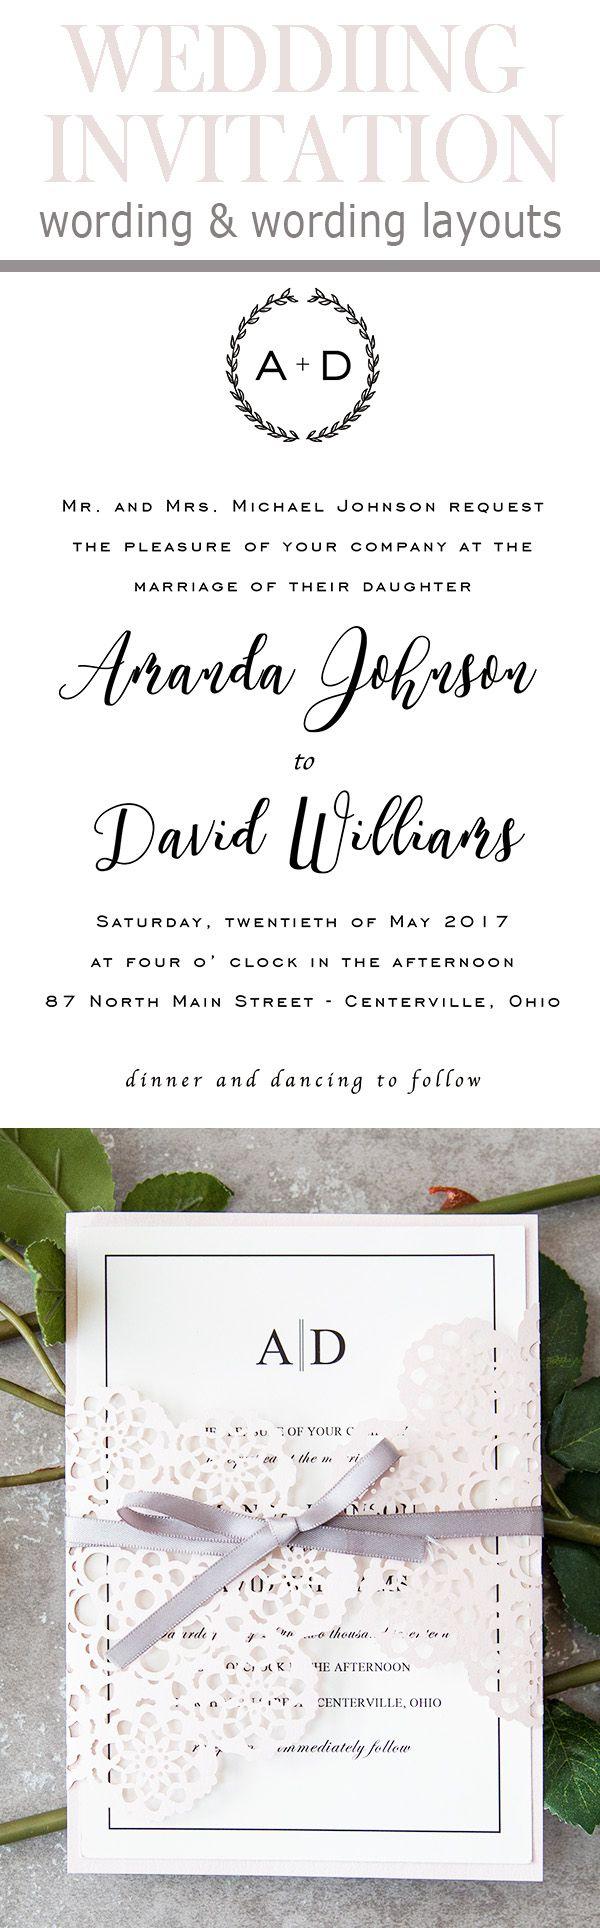 008 Remarkable Formal Wedding Invitation Wording Template Inspiration  TemplatesFull